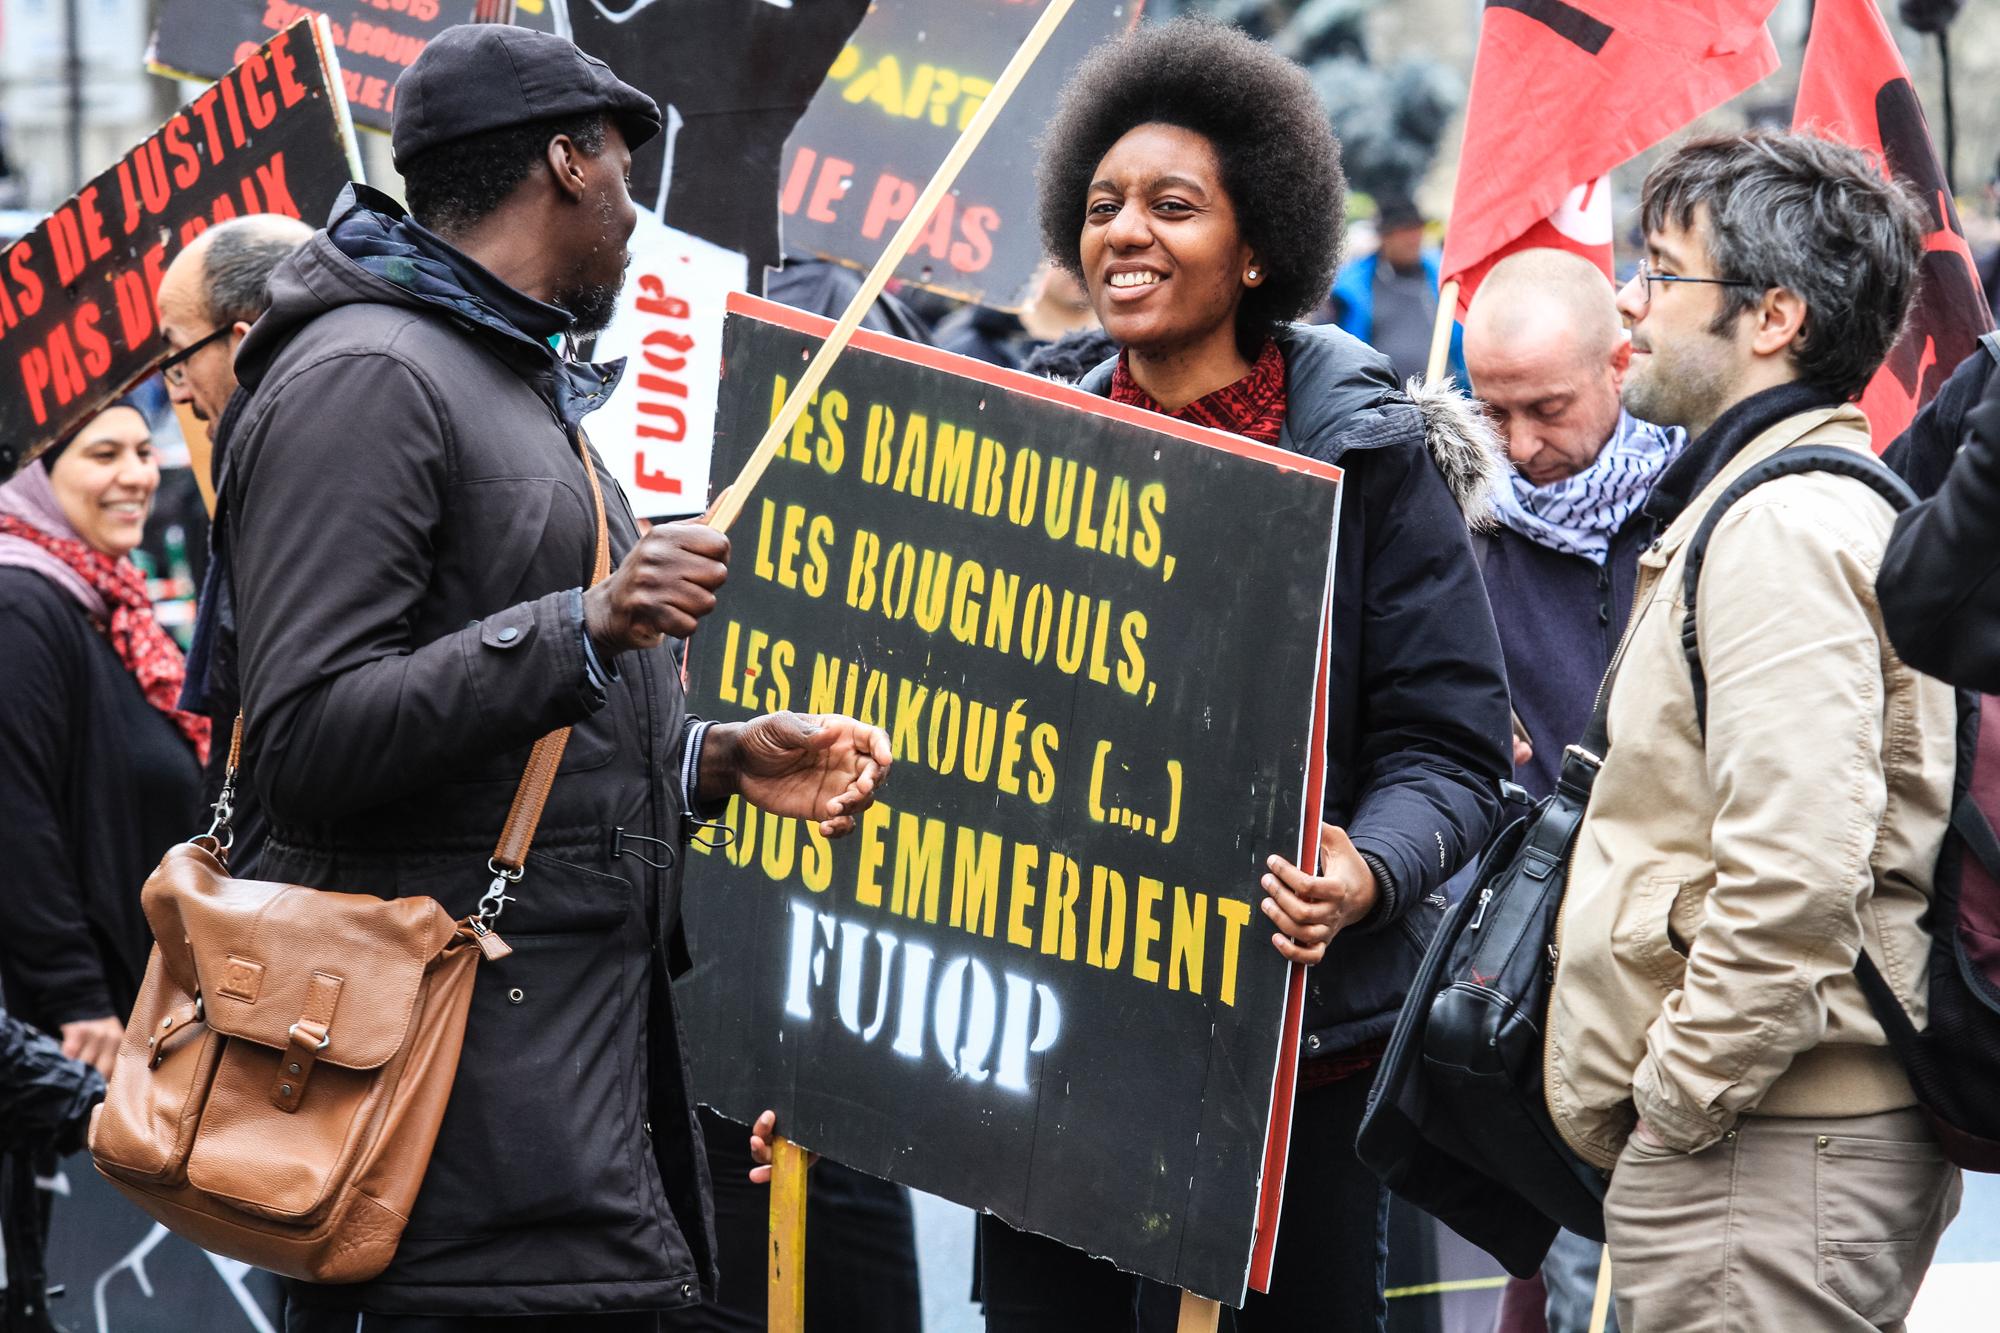 01-201703-MARCHE-CONTRE-VIOLENCES-POLICIERES©Augustin-Le_Gall-Haytham-Pictures-IMG_3379.jpg